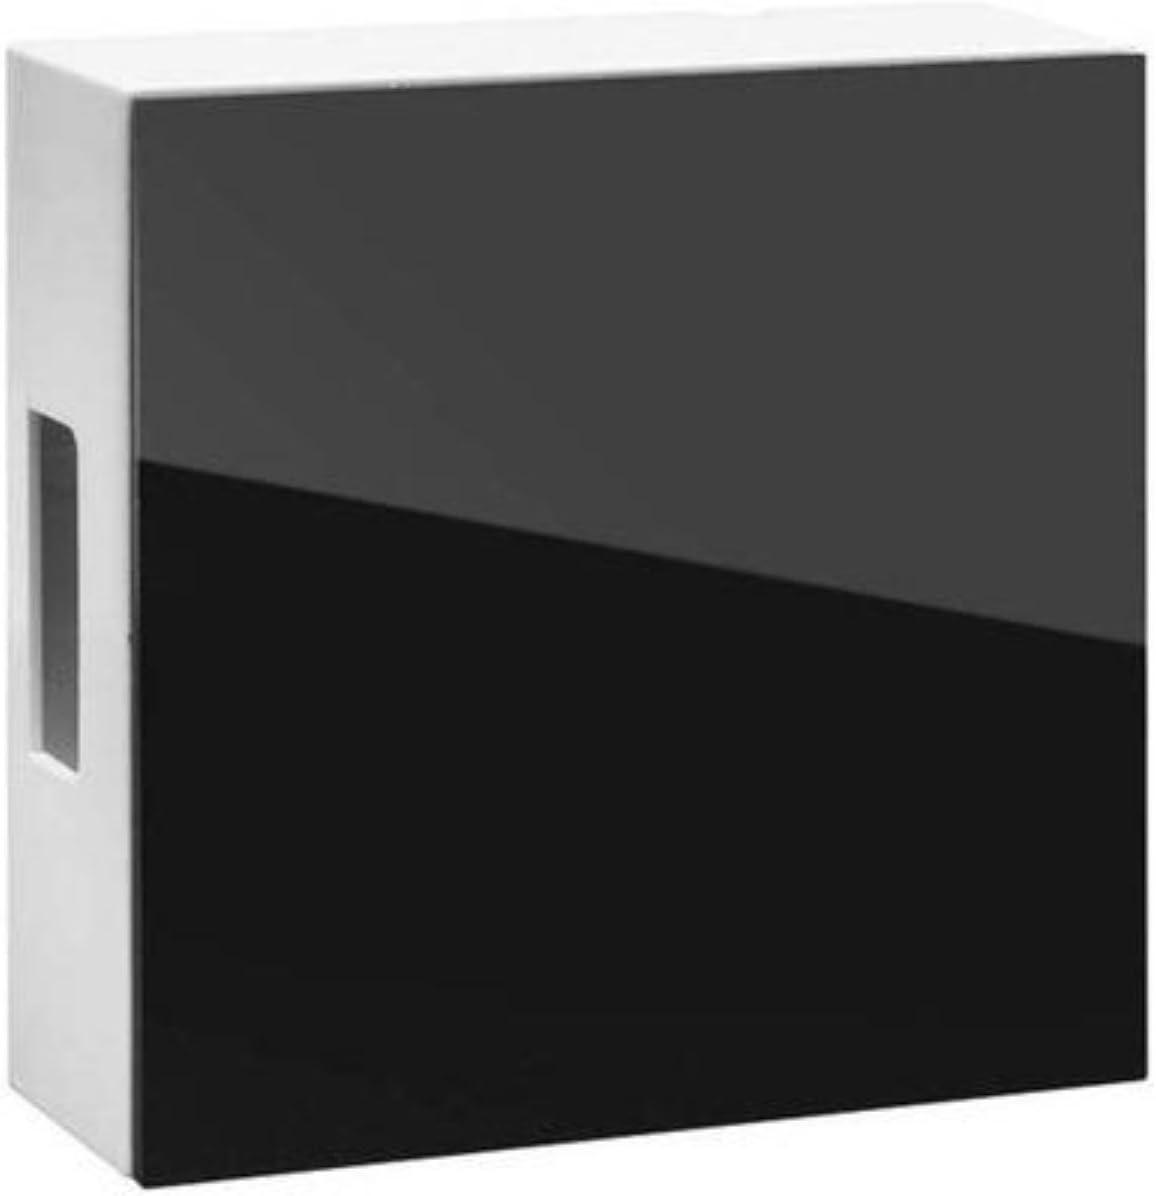 Grothe Zweiklang Gong - Klangplatten aus Glockenstahl hochglänzende Oberfläche - Transformer/ 9V Blockbatterie - (Schwarz)